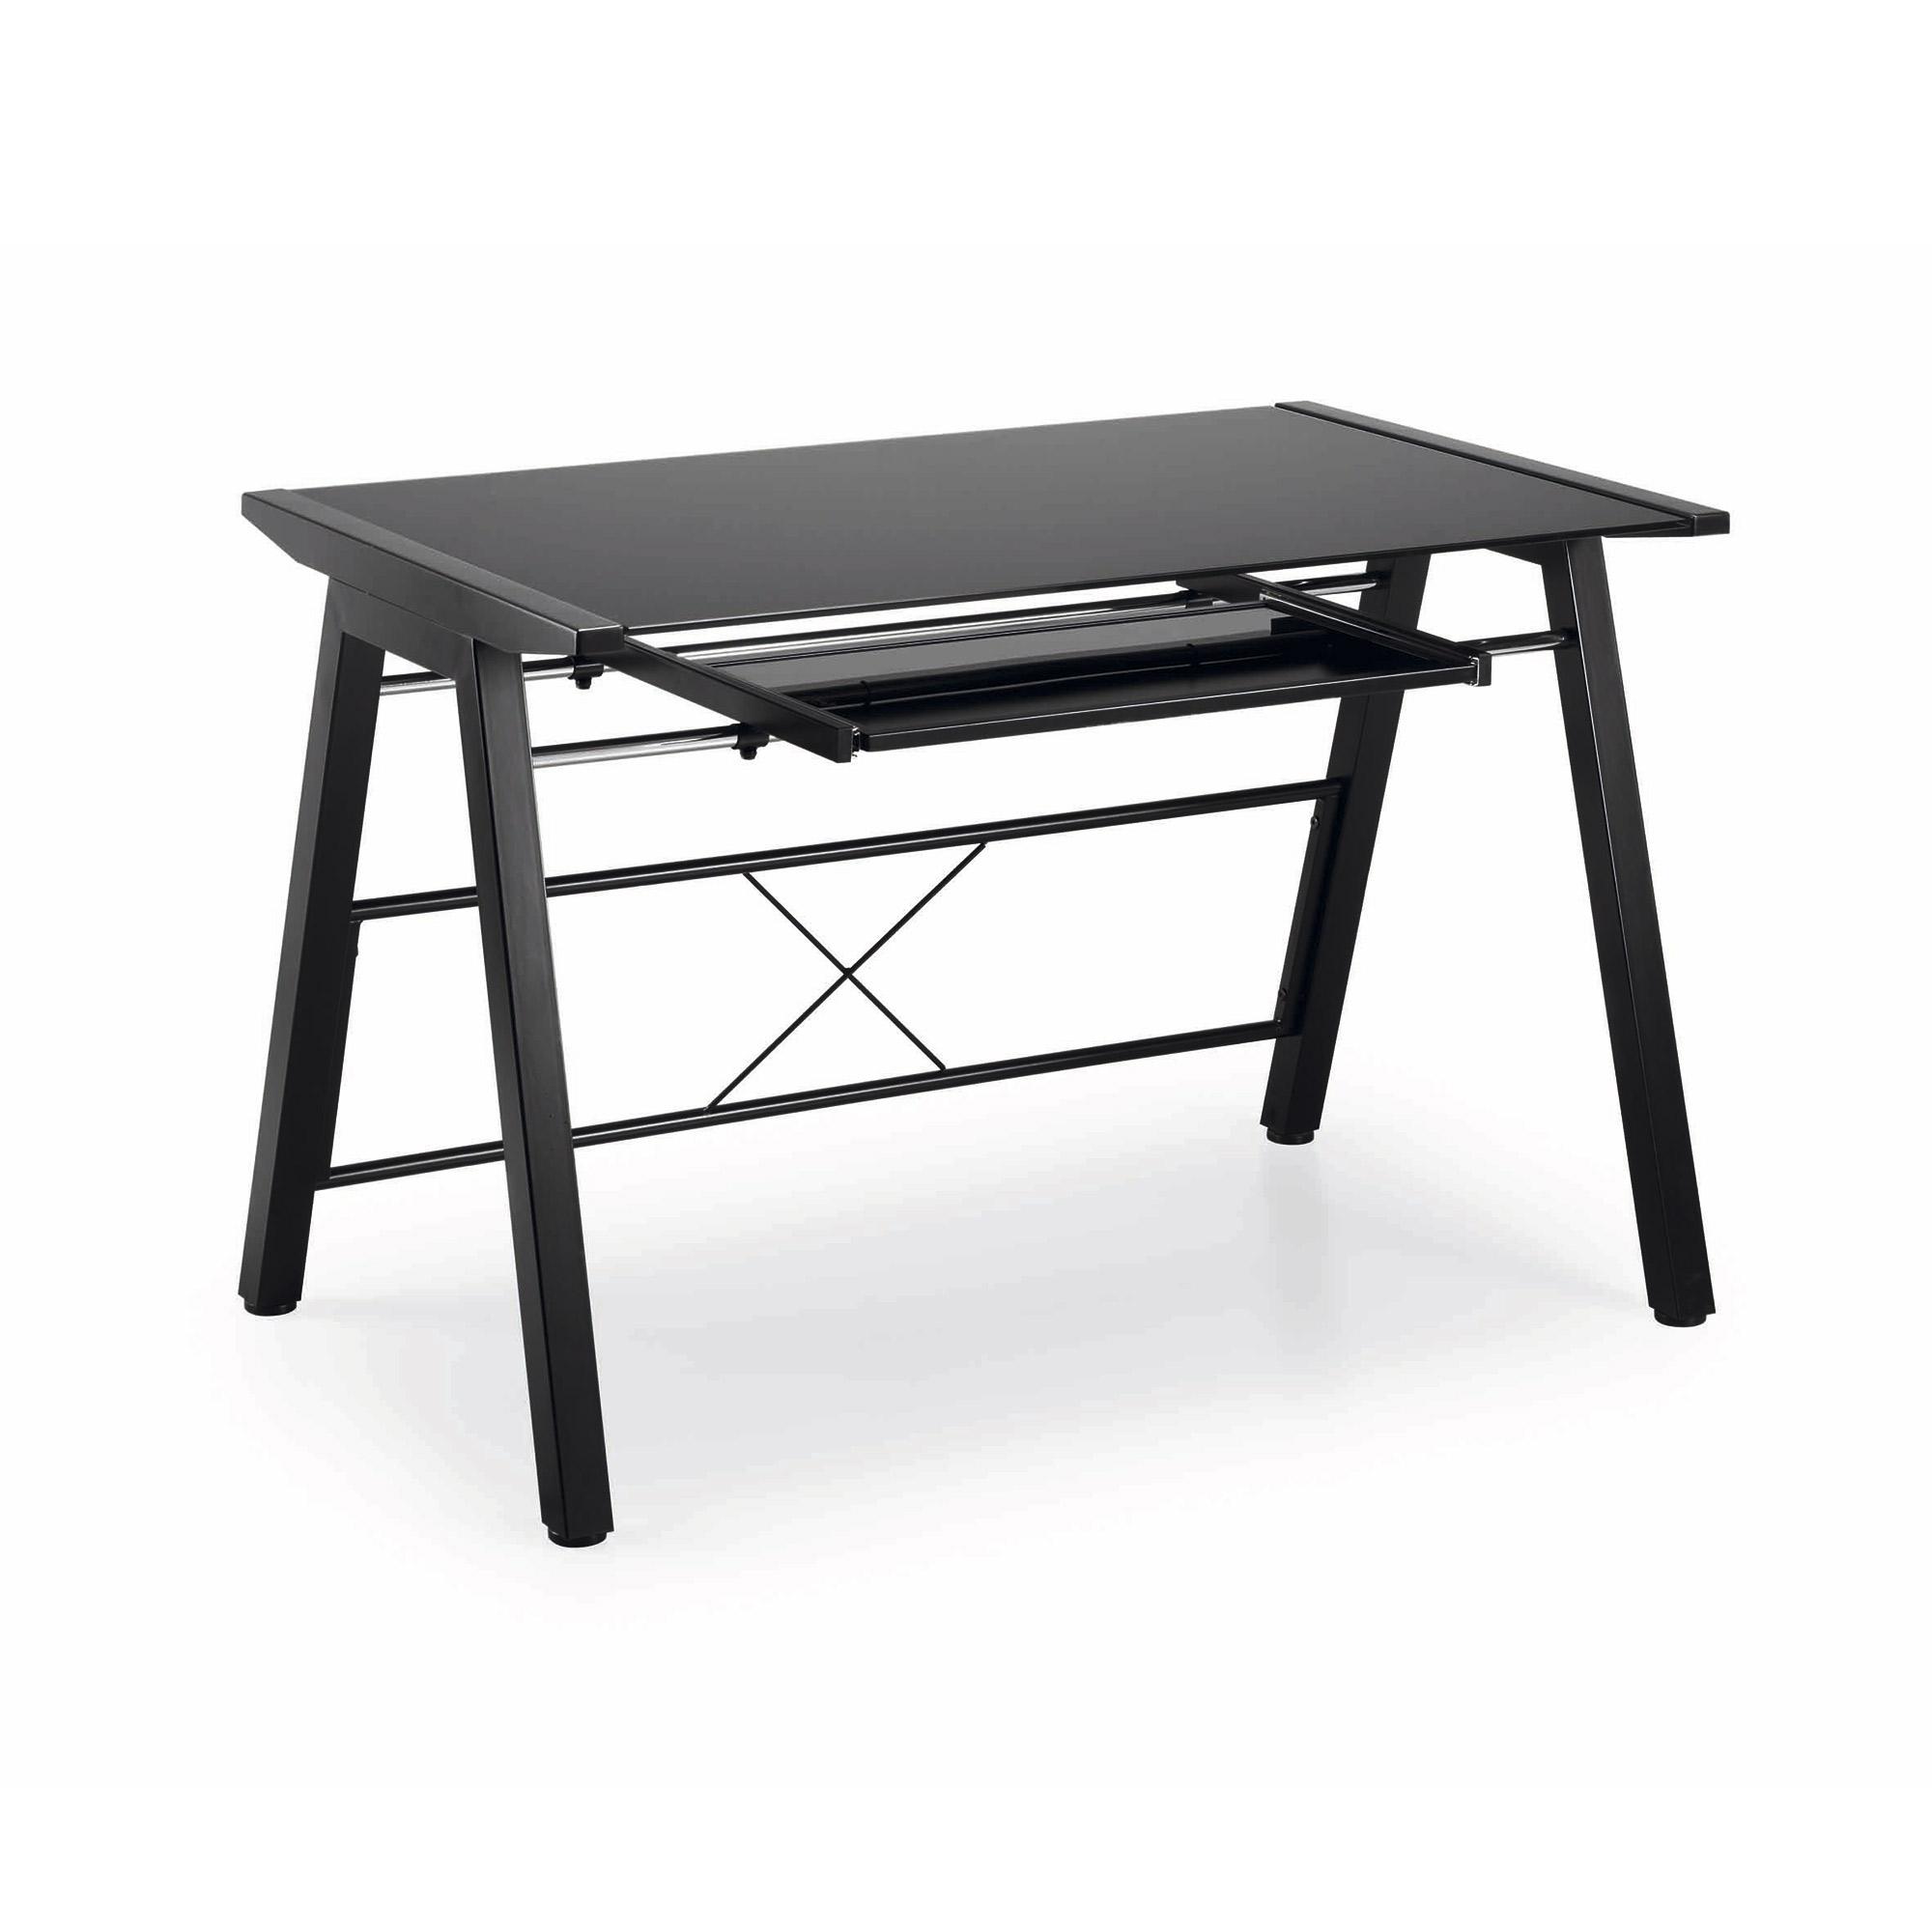 Mesa de escritorio negra moderna medan no disponible en - Mesa escritorio negra ...